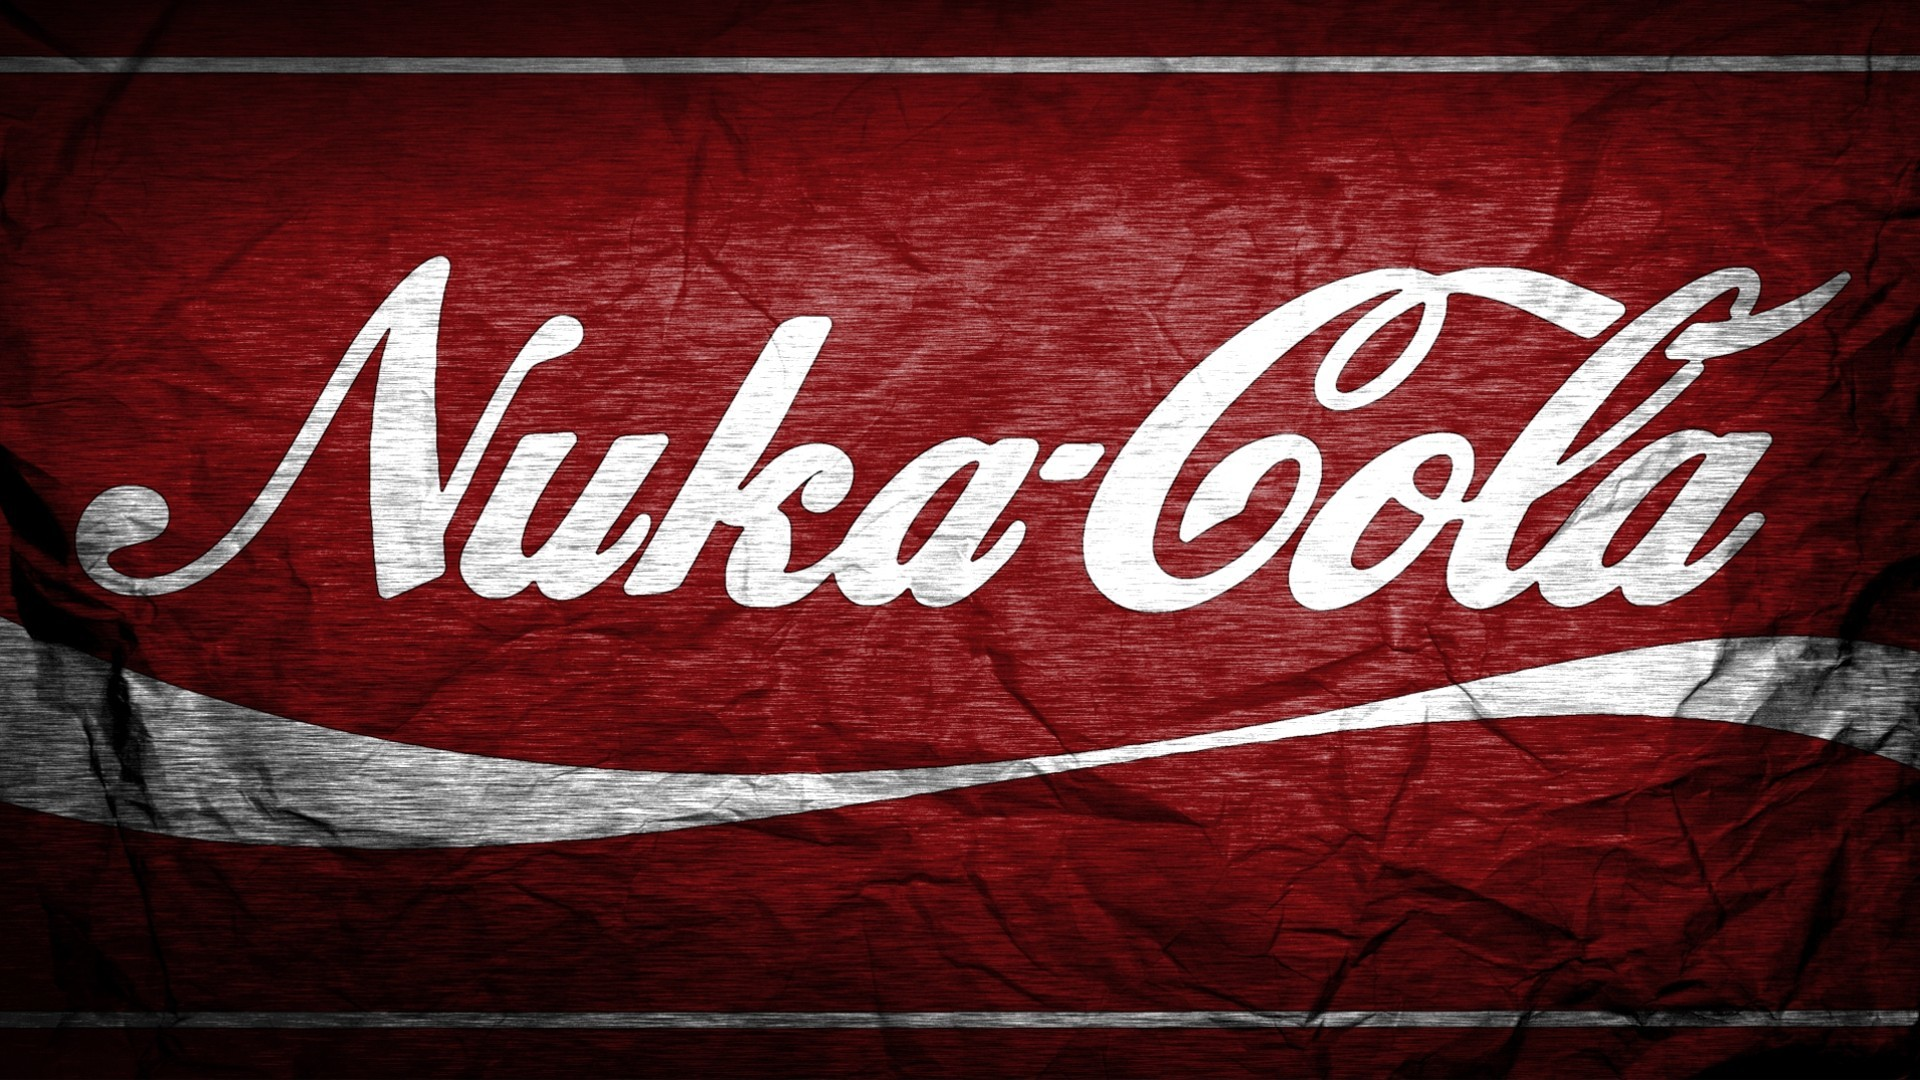 Nuka Cola, Fallout 4 Wallpaper HD